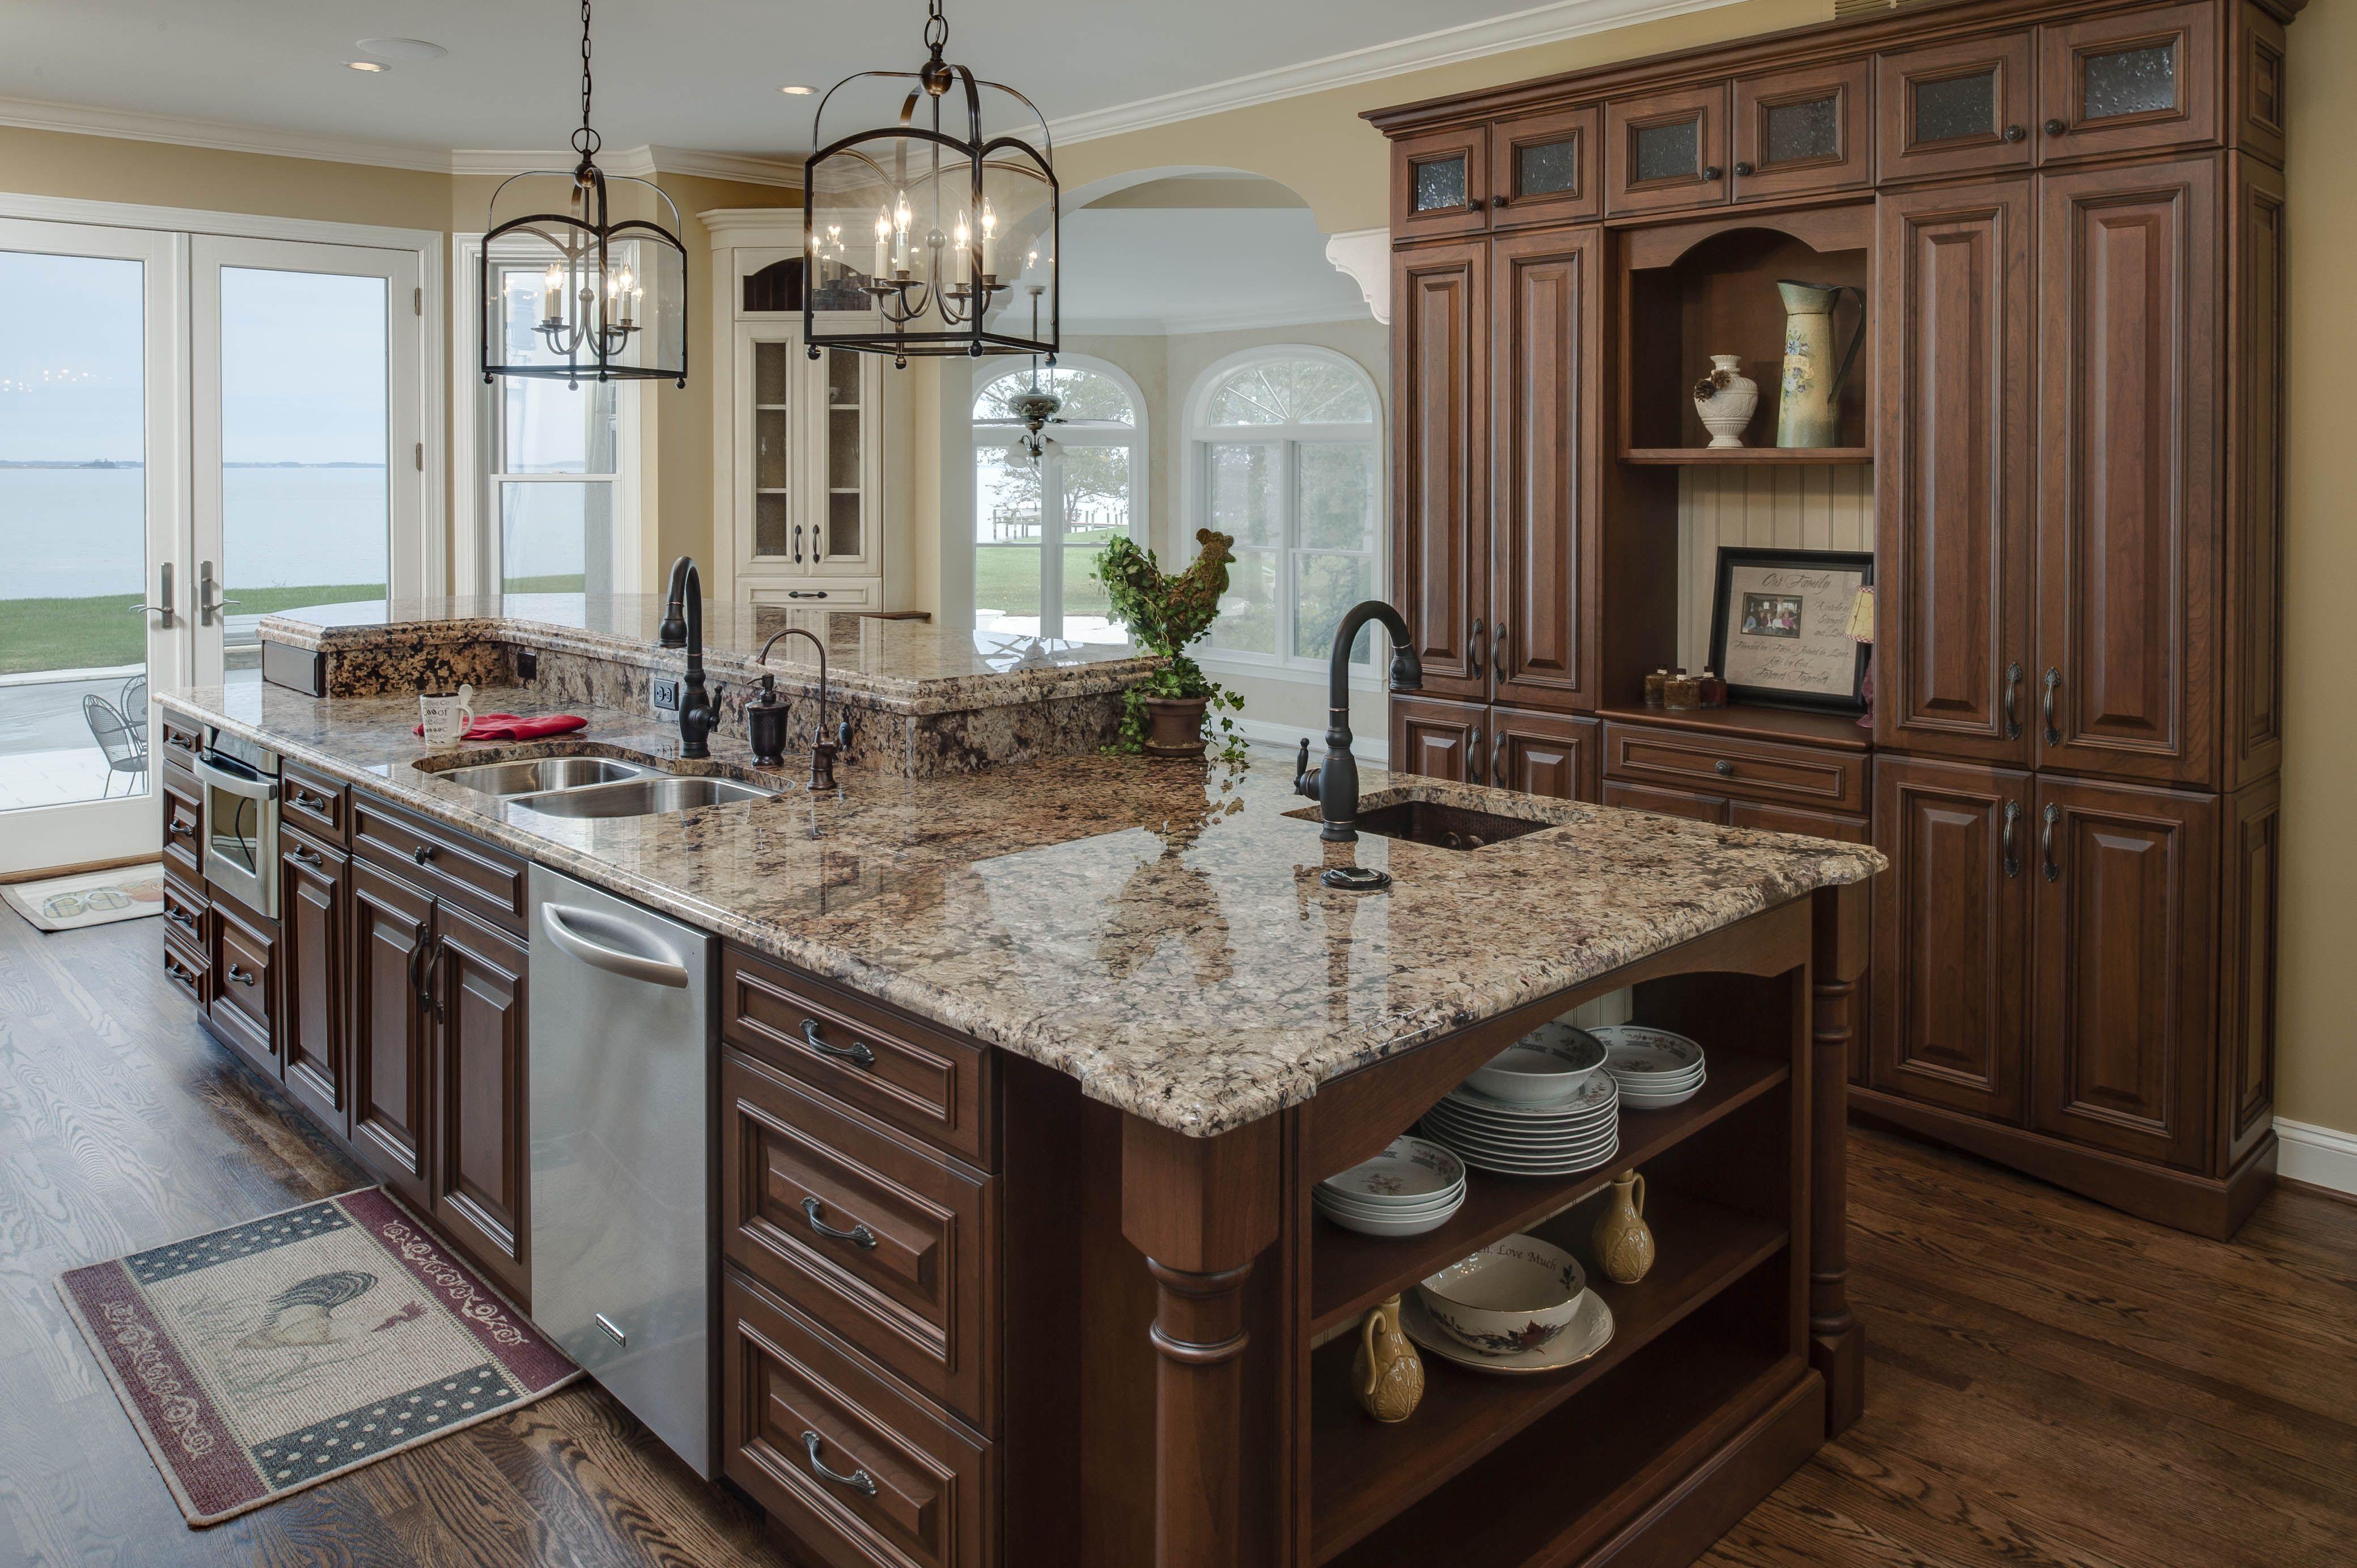 Award Winning Kitchen Designs Entrancing Decorating Inspiration